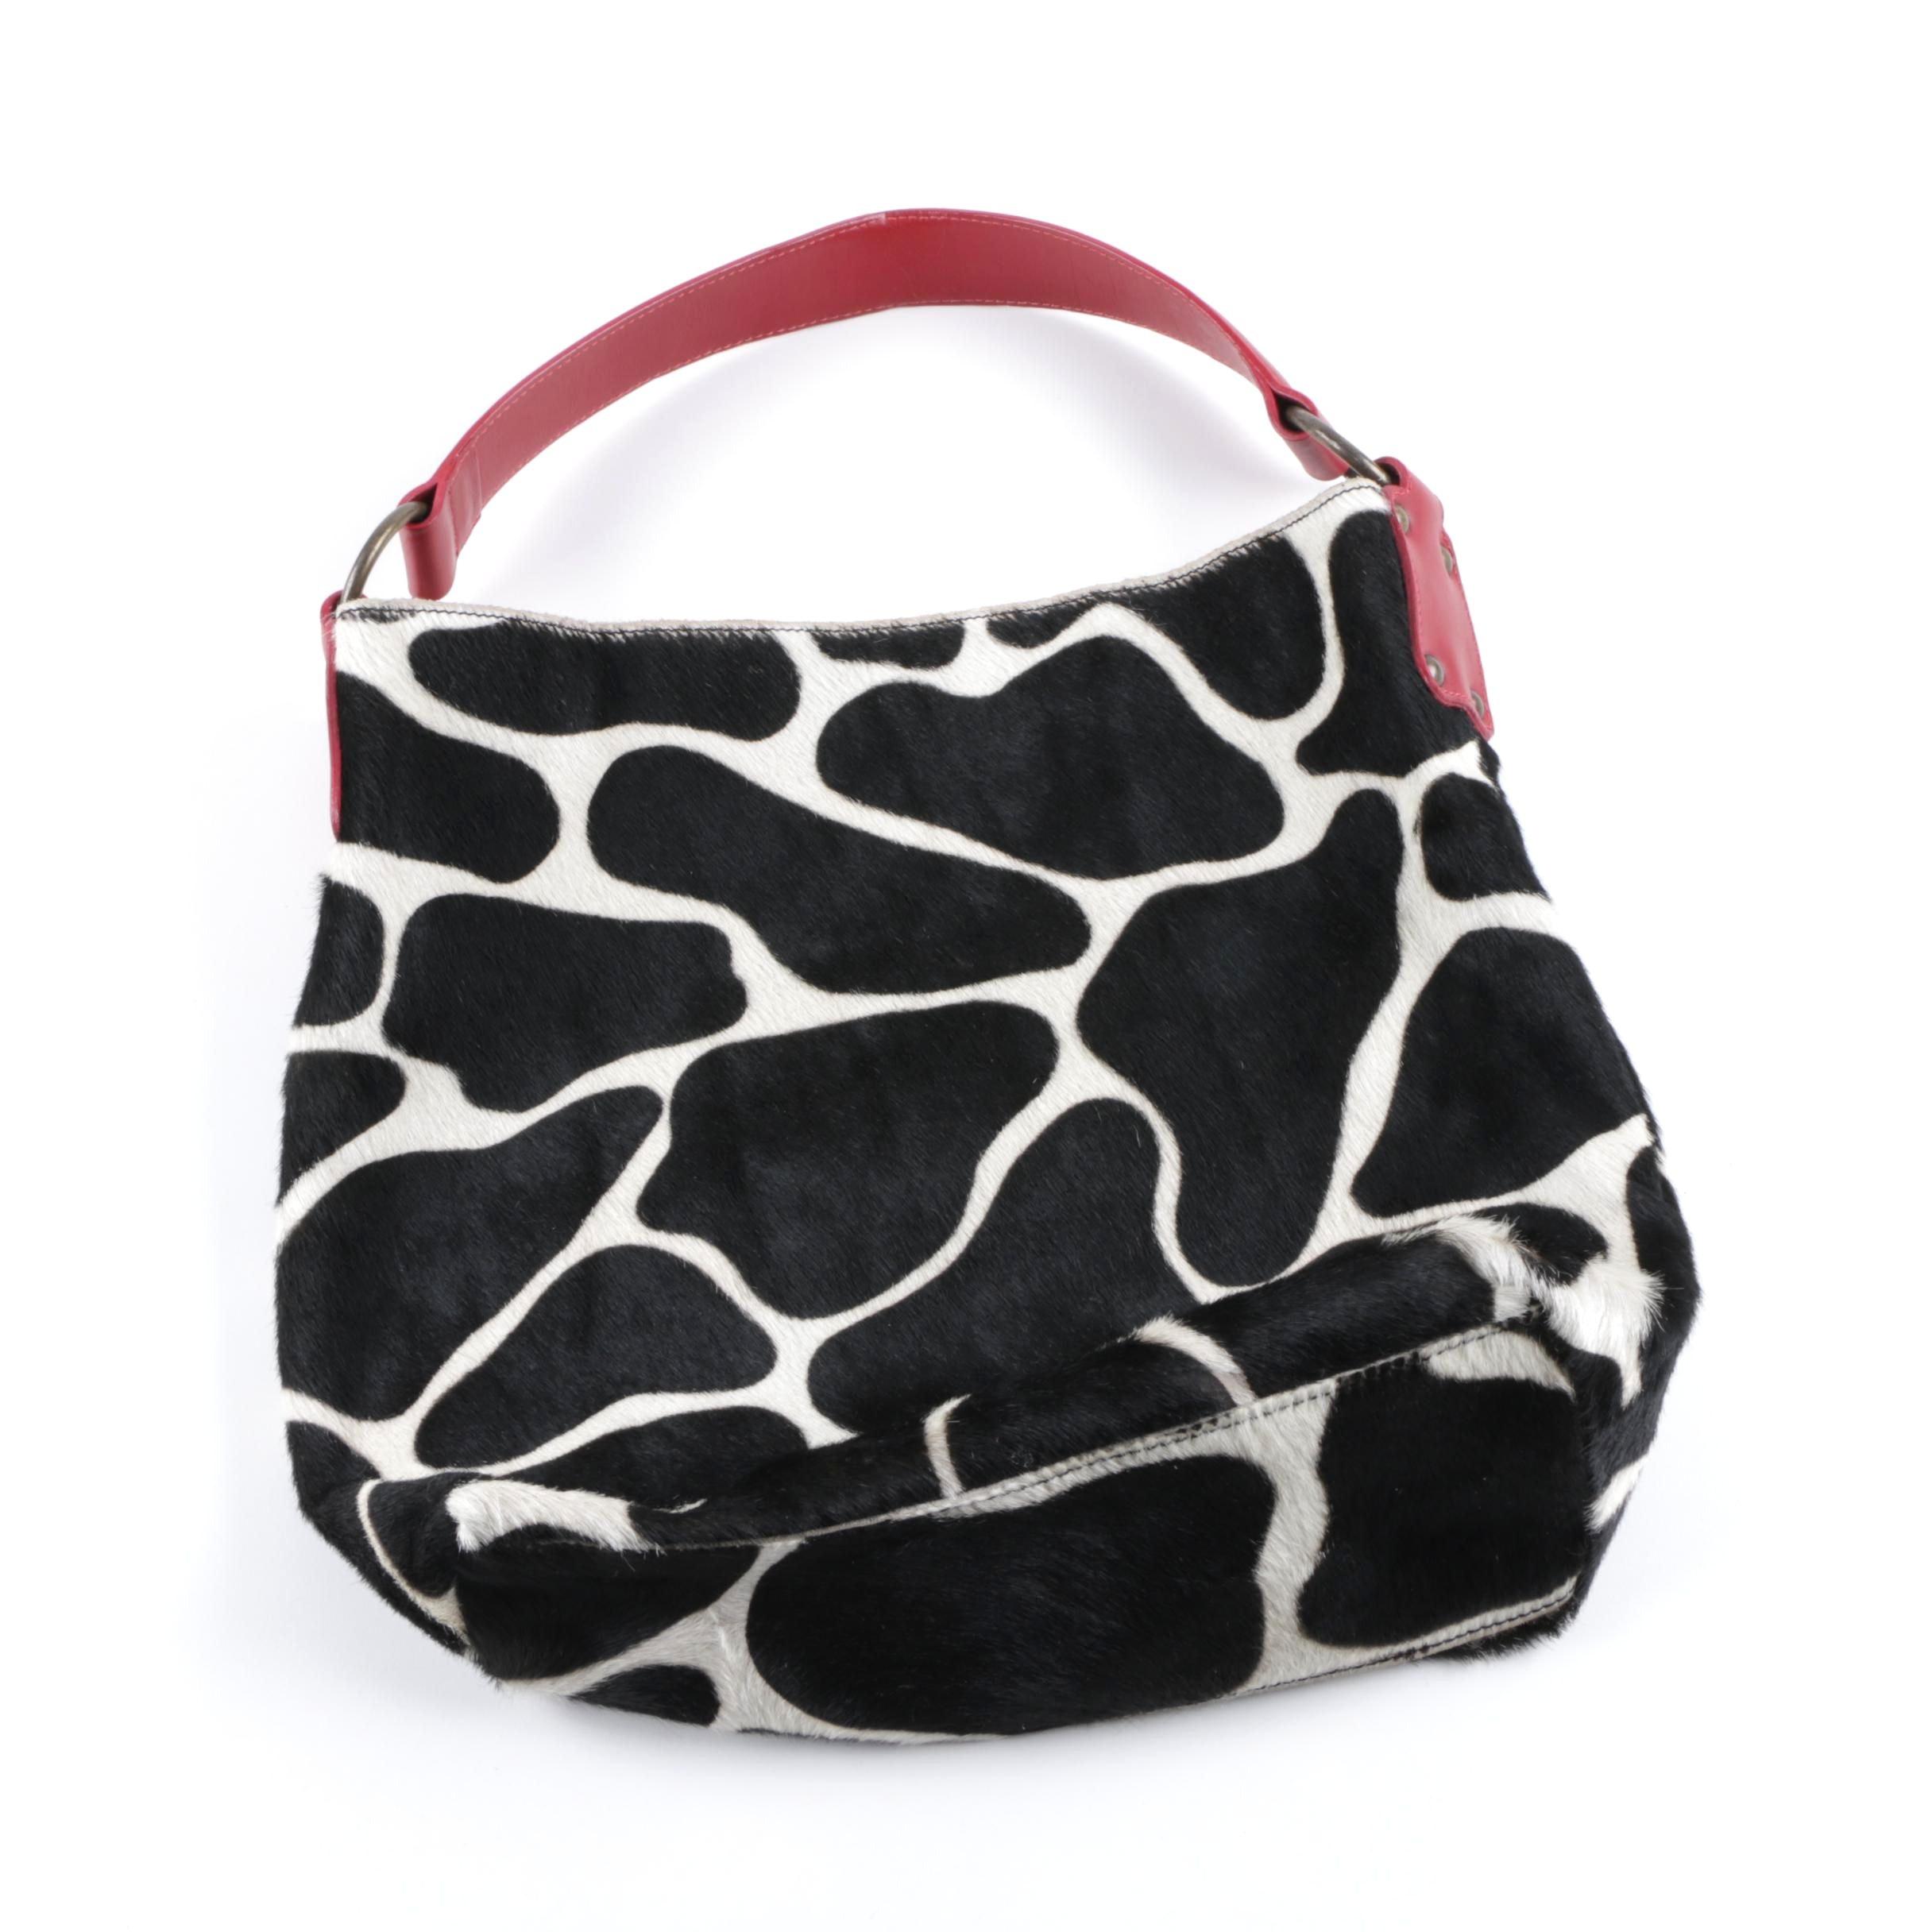 Maurizio Taiuti Dyed Calf Hair Handbag